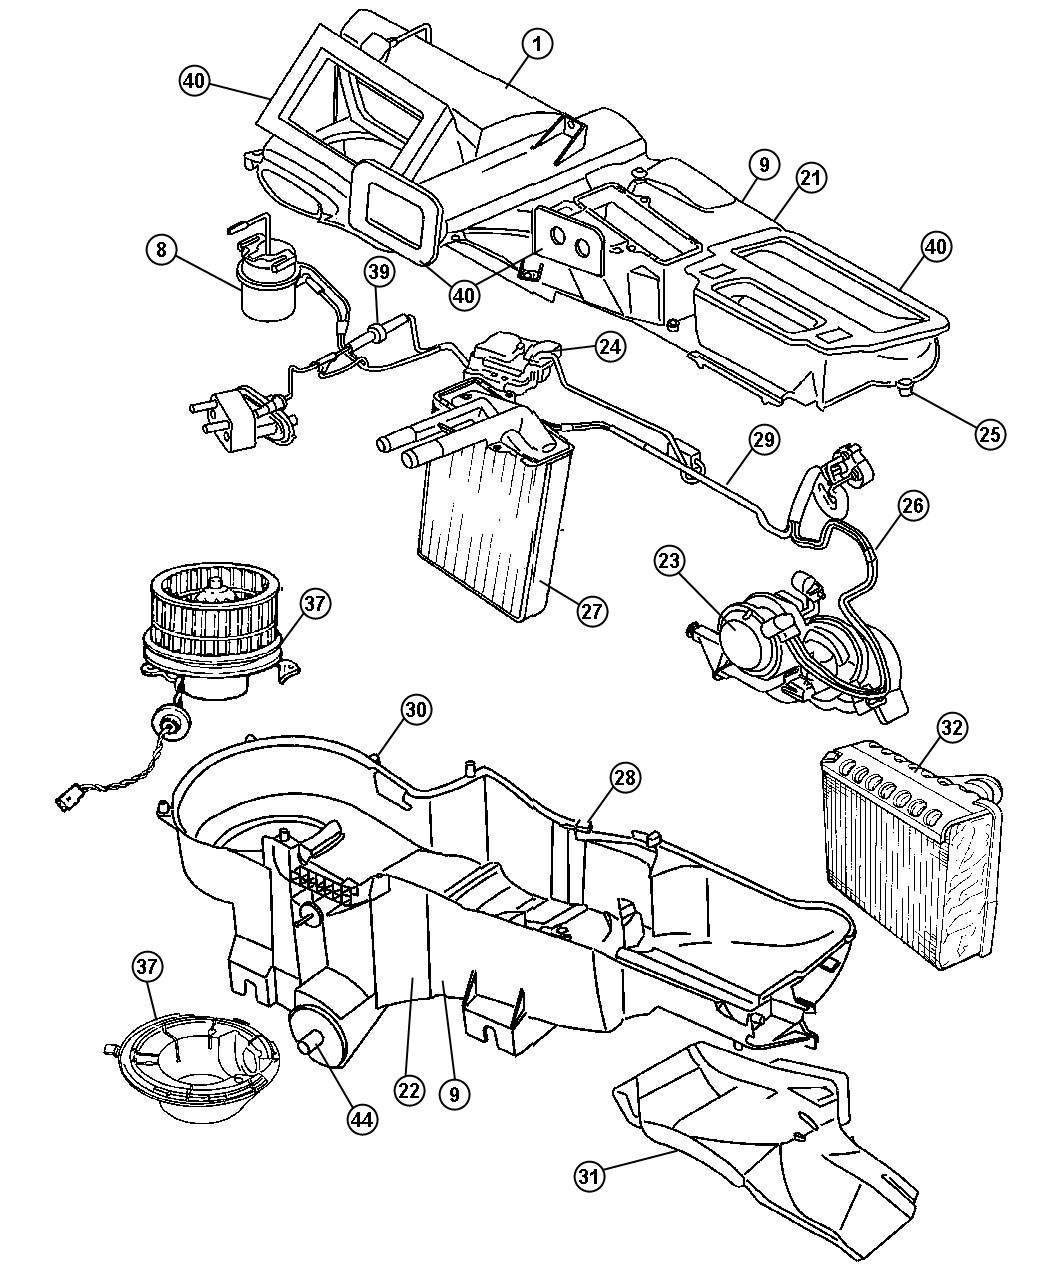 Jeep Wrangler Pcm Wiring Diagram